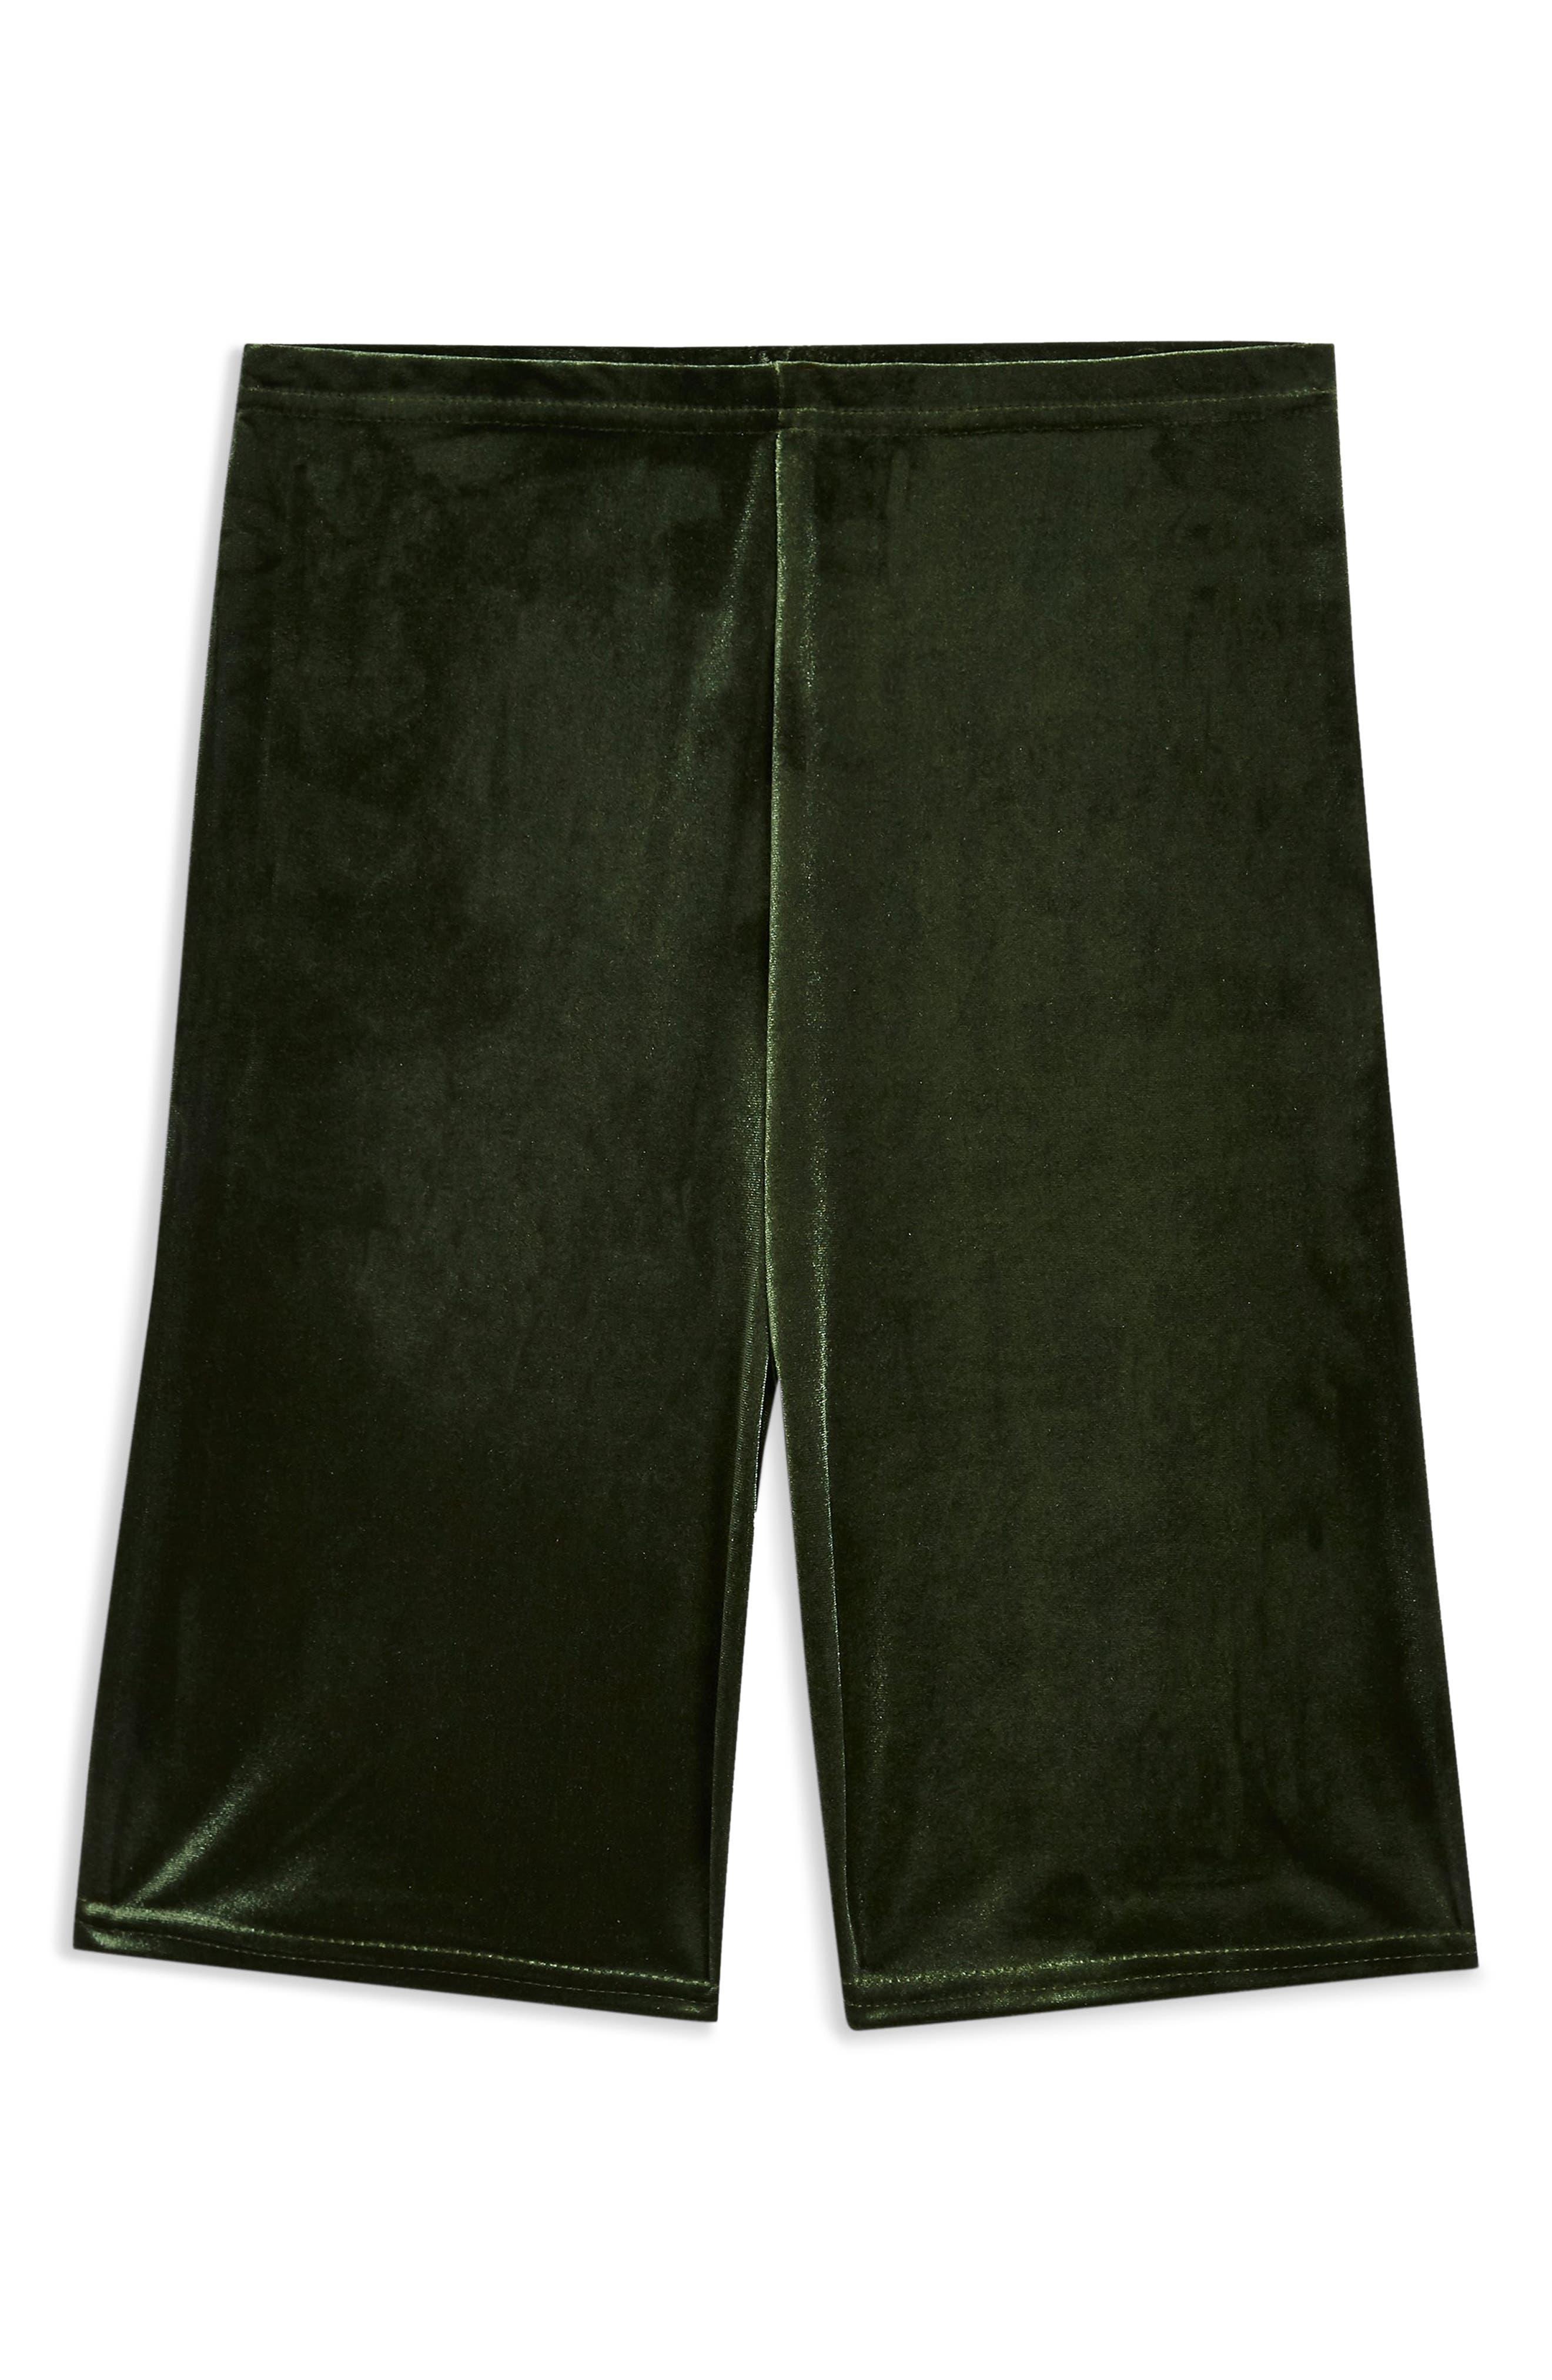 Velvet Cycling Shorts,                             Alternate thumbnail 3, color,                             OLIVE